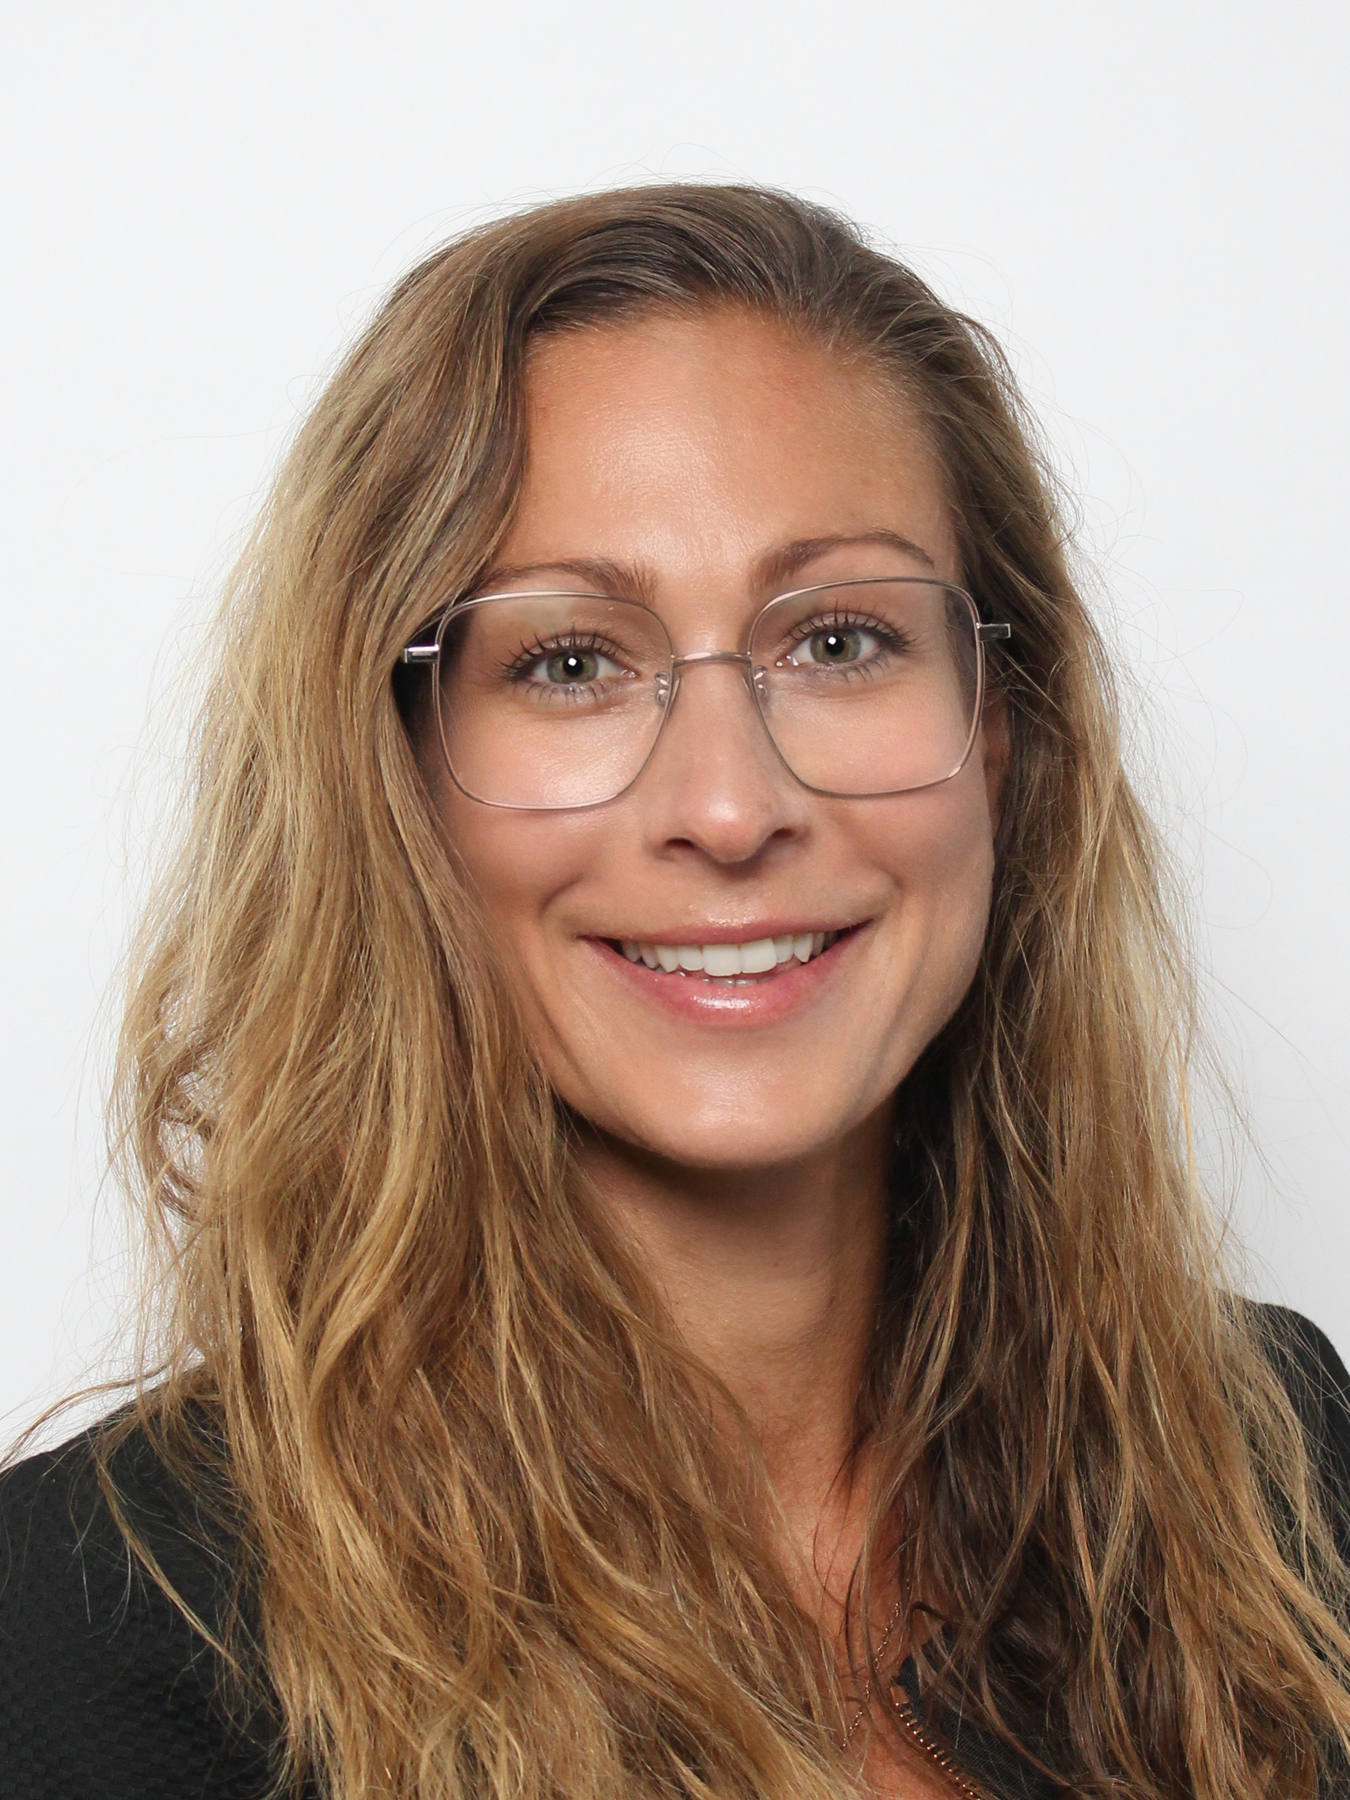 Dipl.-Psych. Alexandra Emmersberger - Psychologische Psychotherapeutin in München